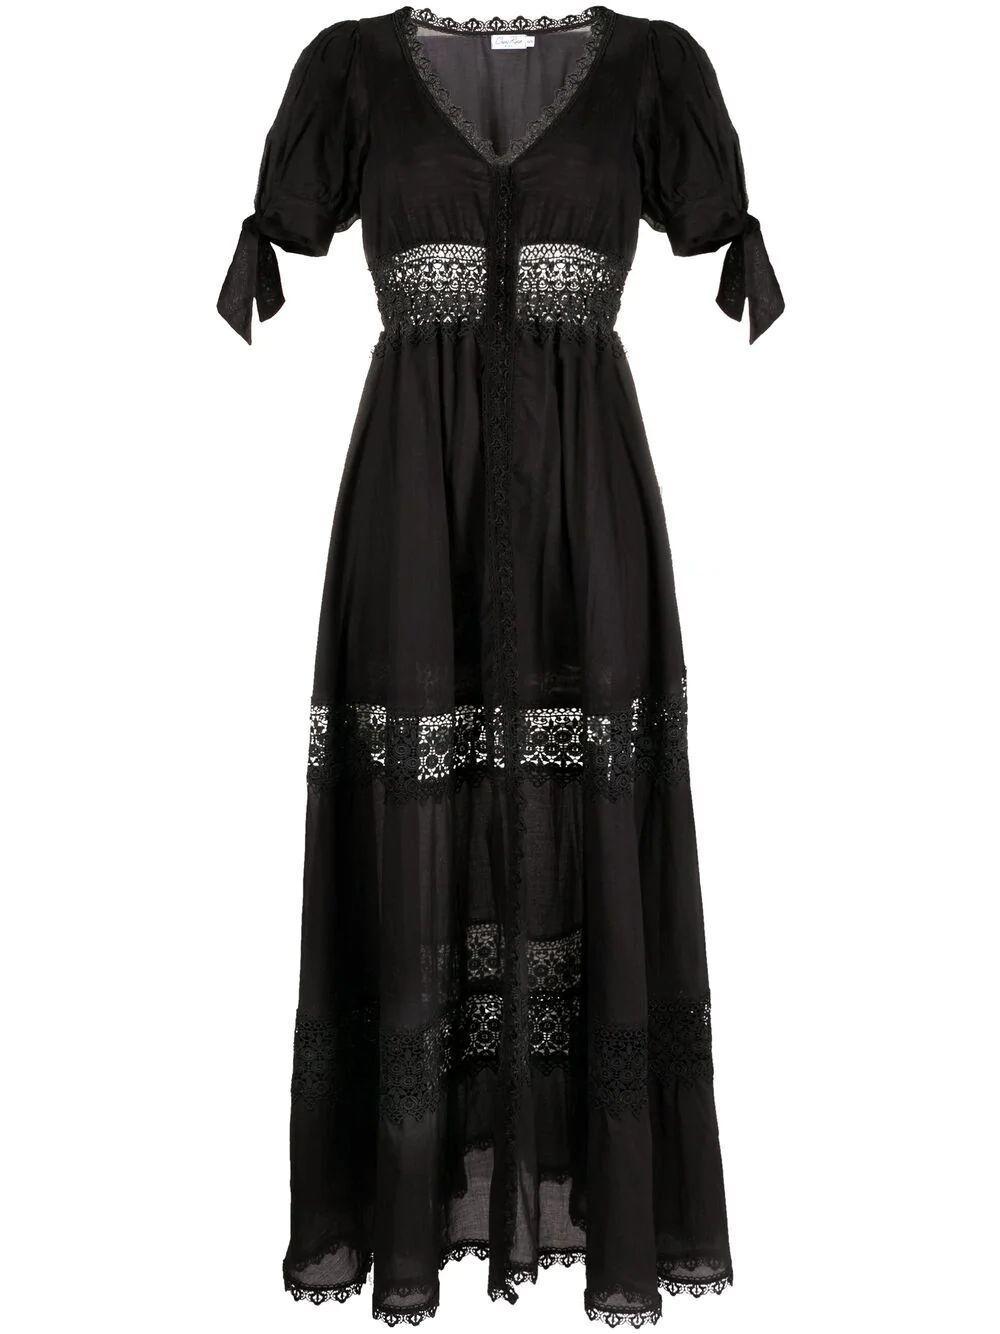 Thelma Maxi Dress Item # 211625